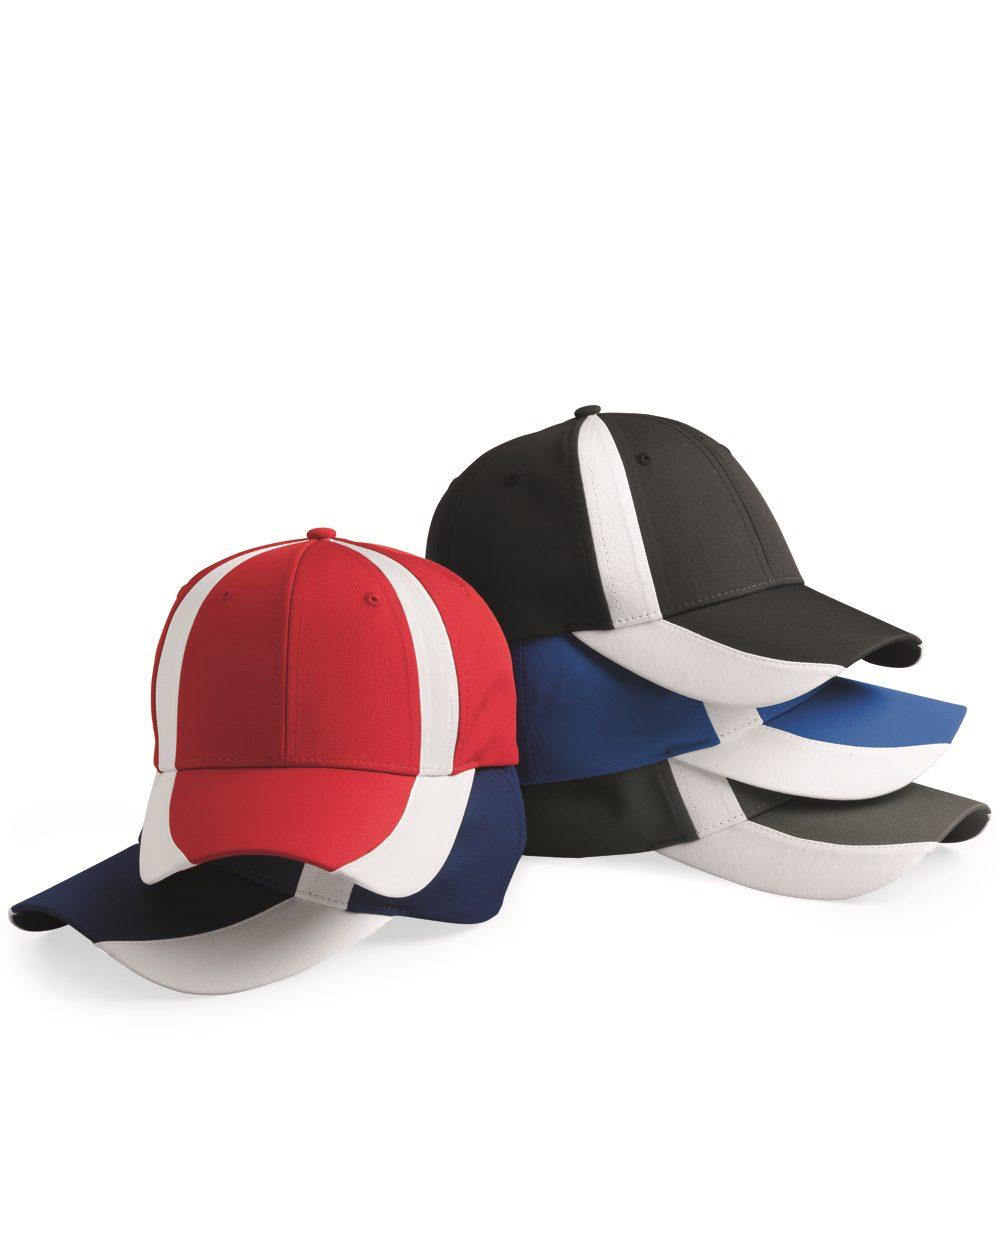 Authentic Headwear AH50 - Dri-Fit Performance Cut and Sew Cap